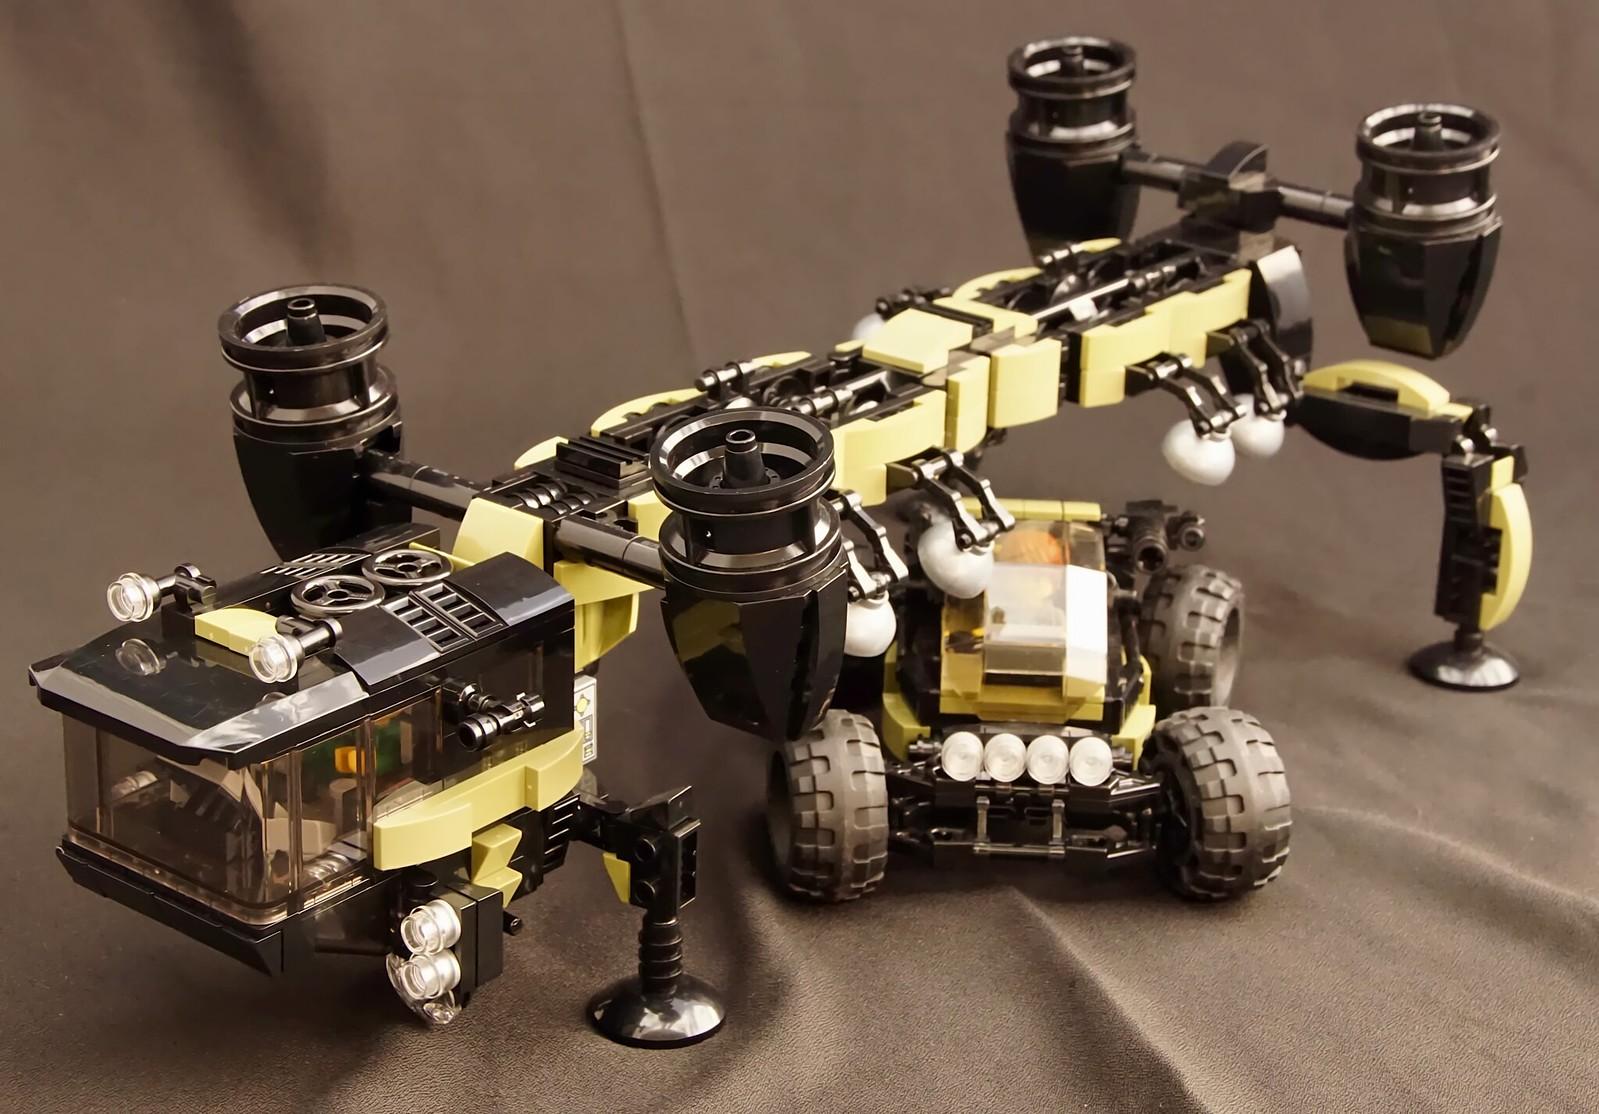 DooM Inc. Drop Ship with Scout ATV